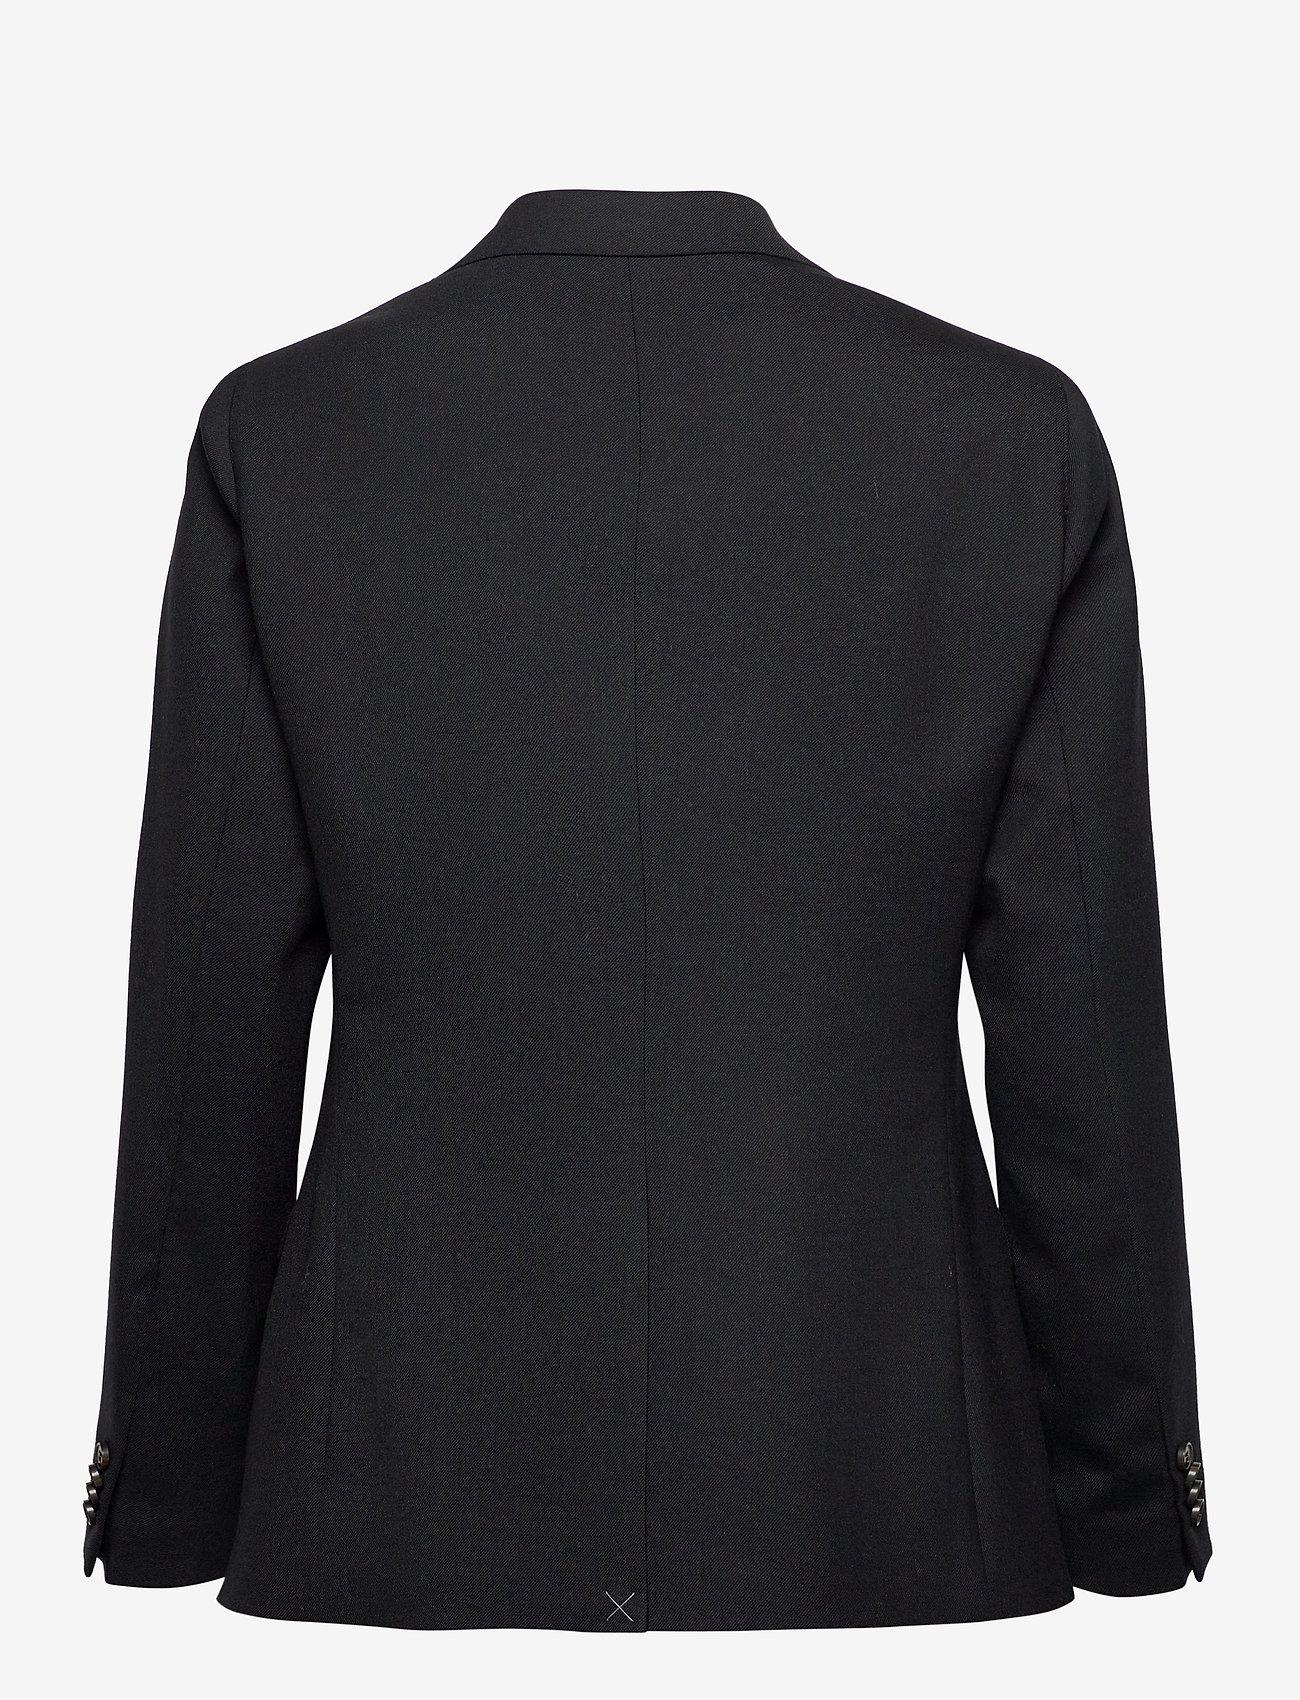 SAND - 2558 - Rani DB - getailleerde blazers - black - 1